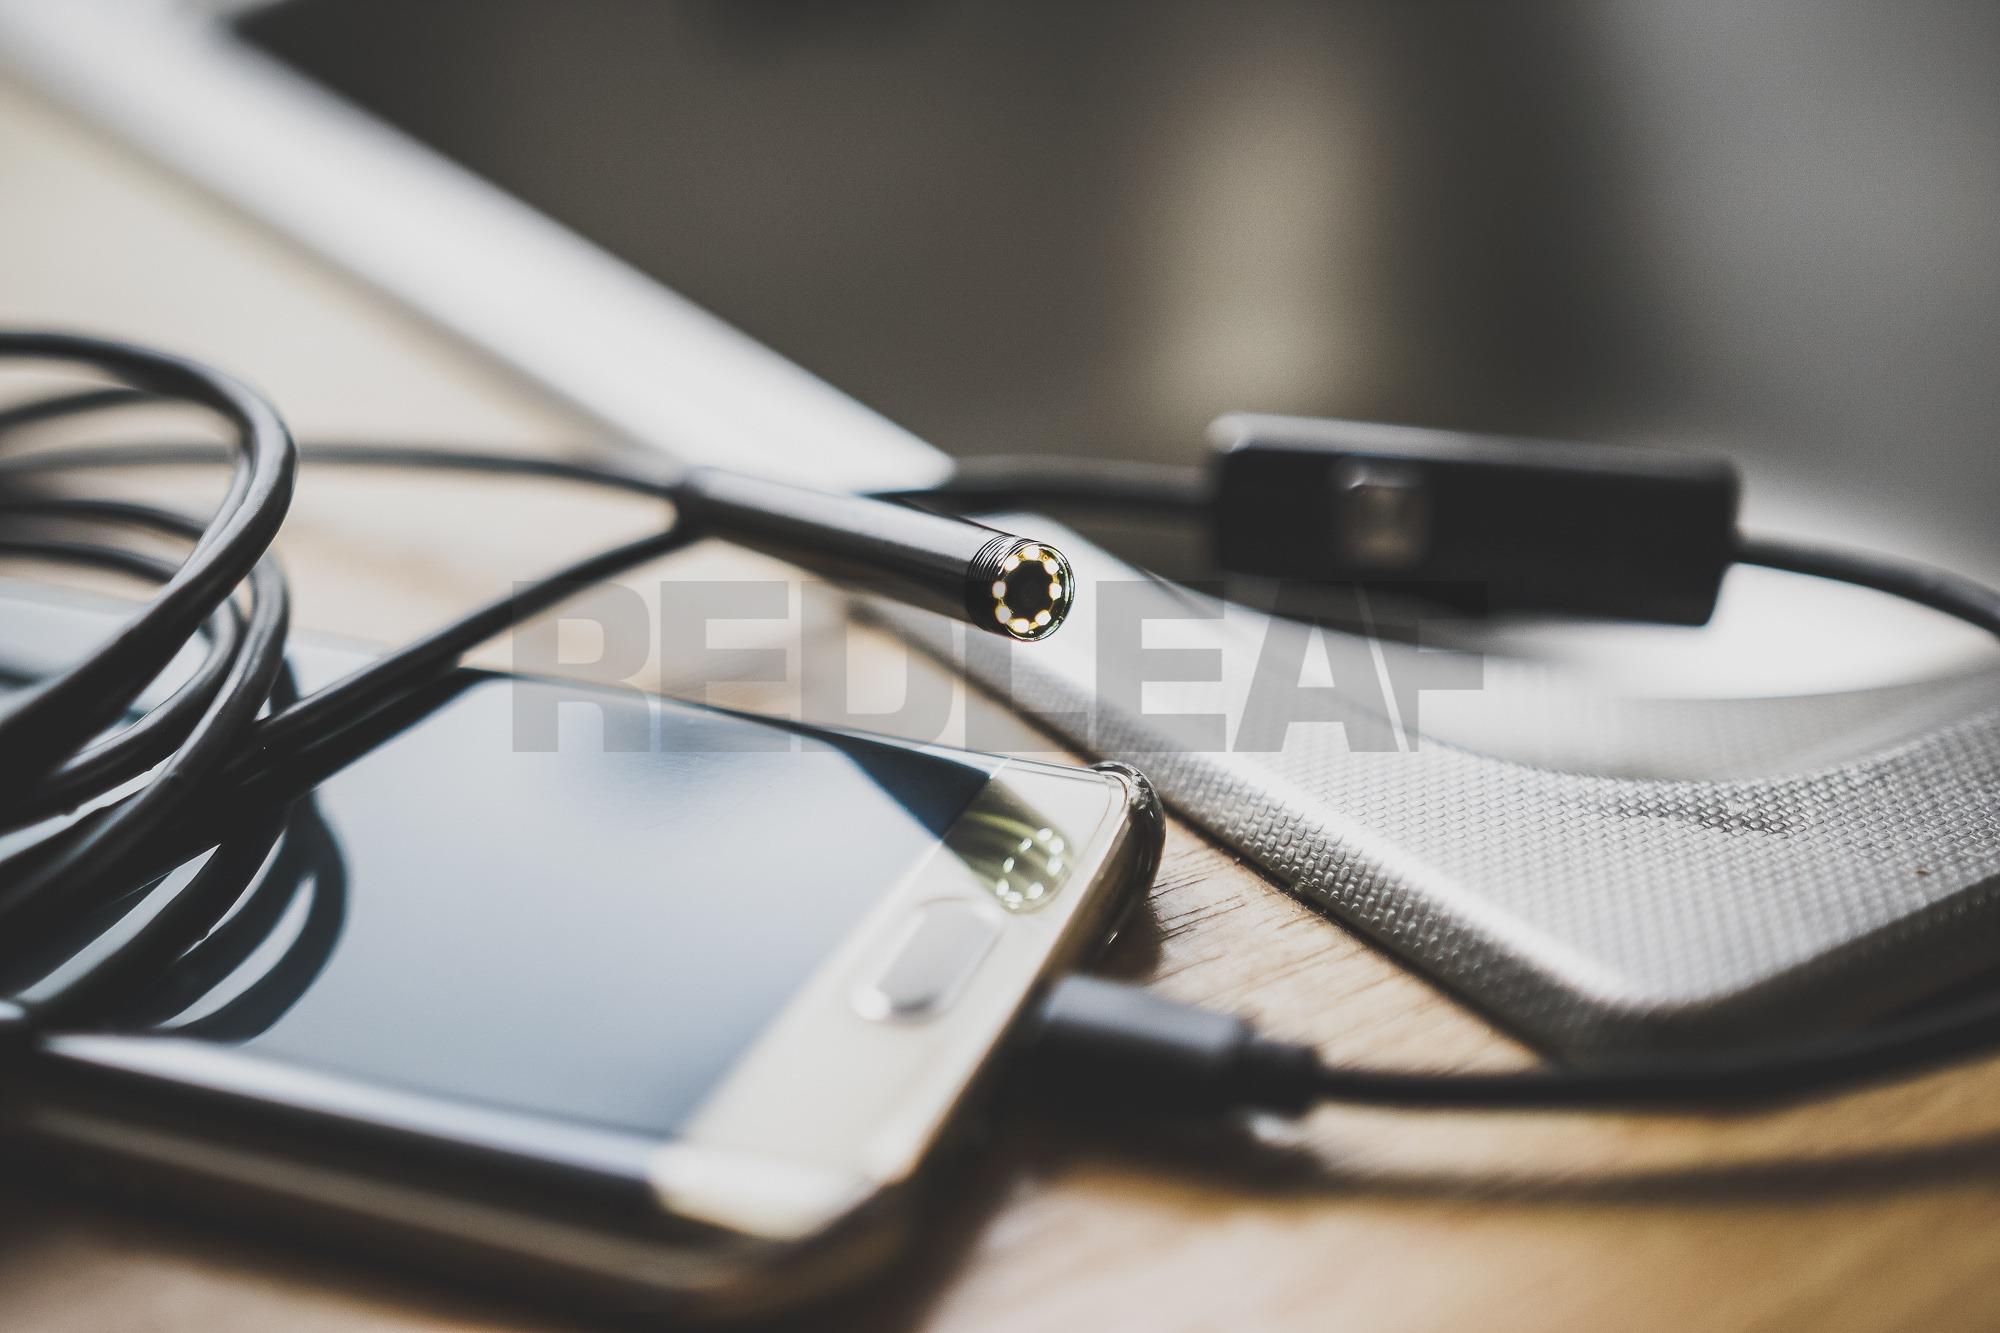 Endoskop-USB-Redleaf-RDE-105US-elastyczny-kabel-5-m_07_HD